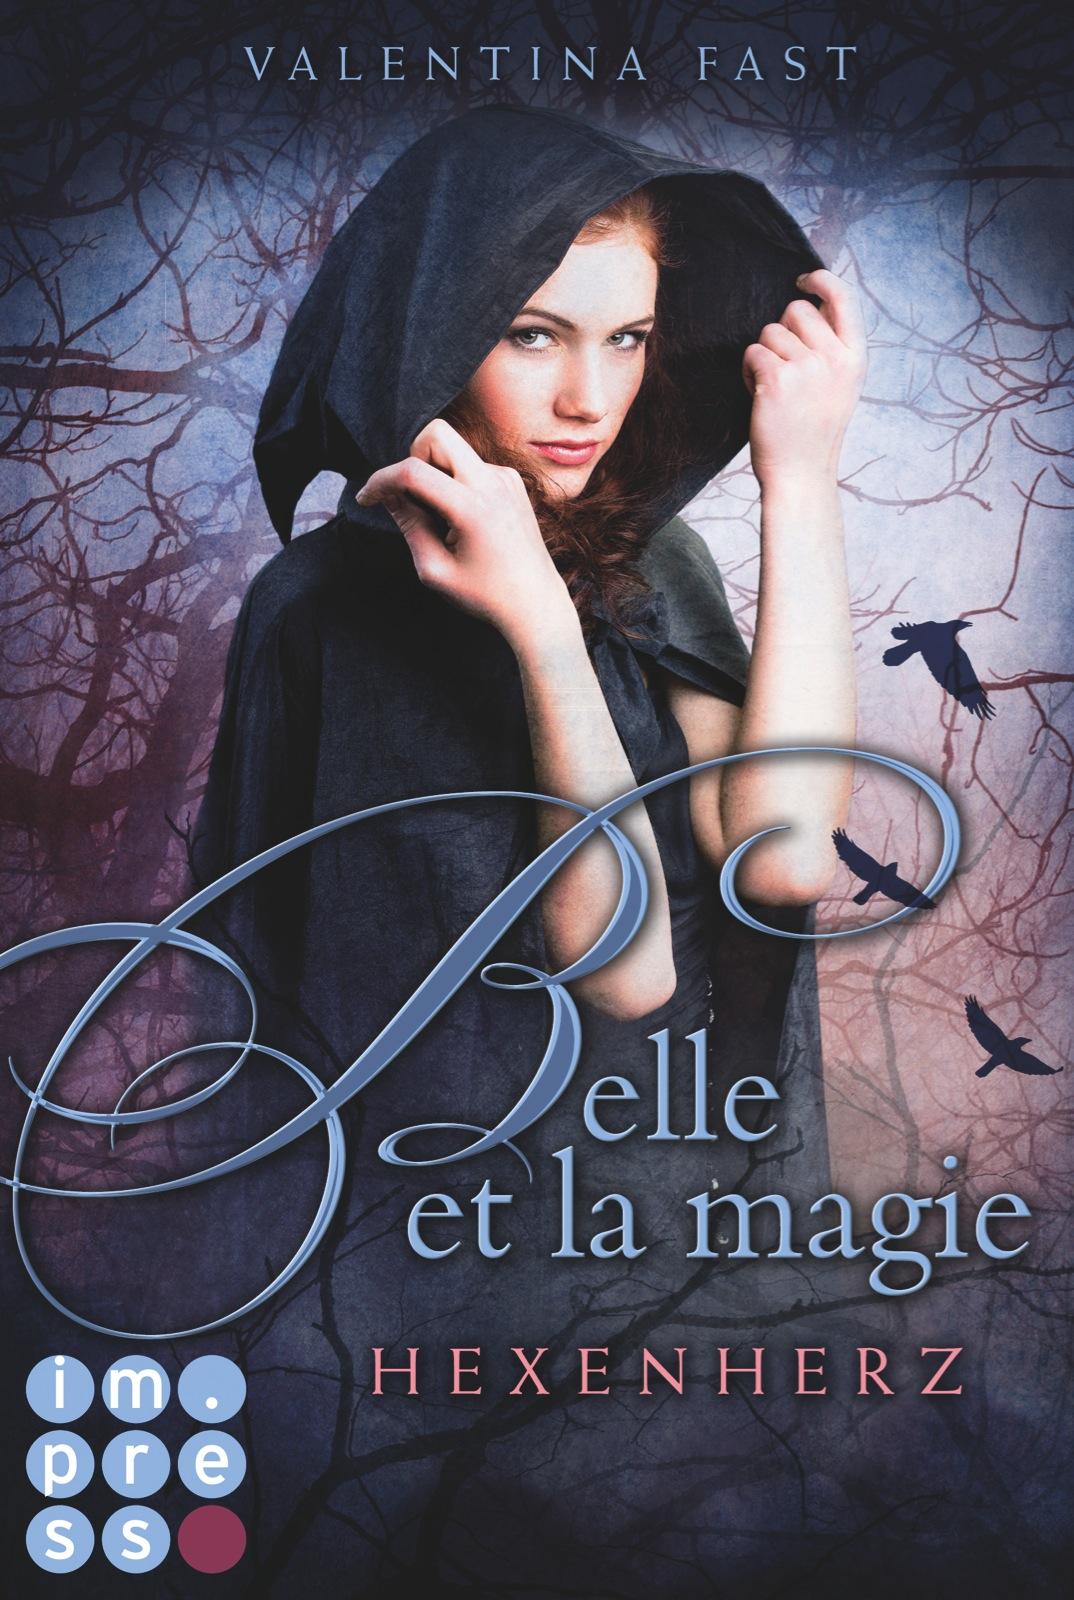 Fast, Valentina : Belle et la magie - Hexenherz